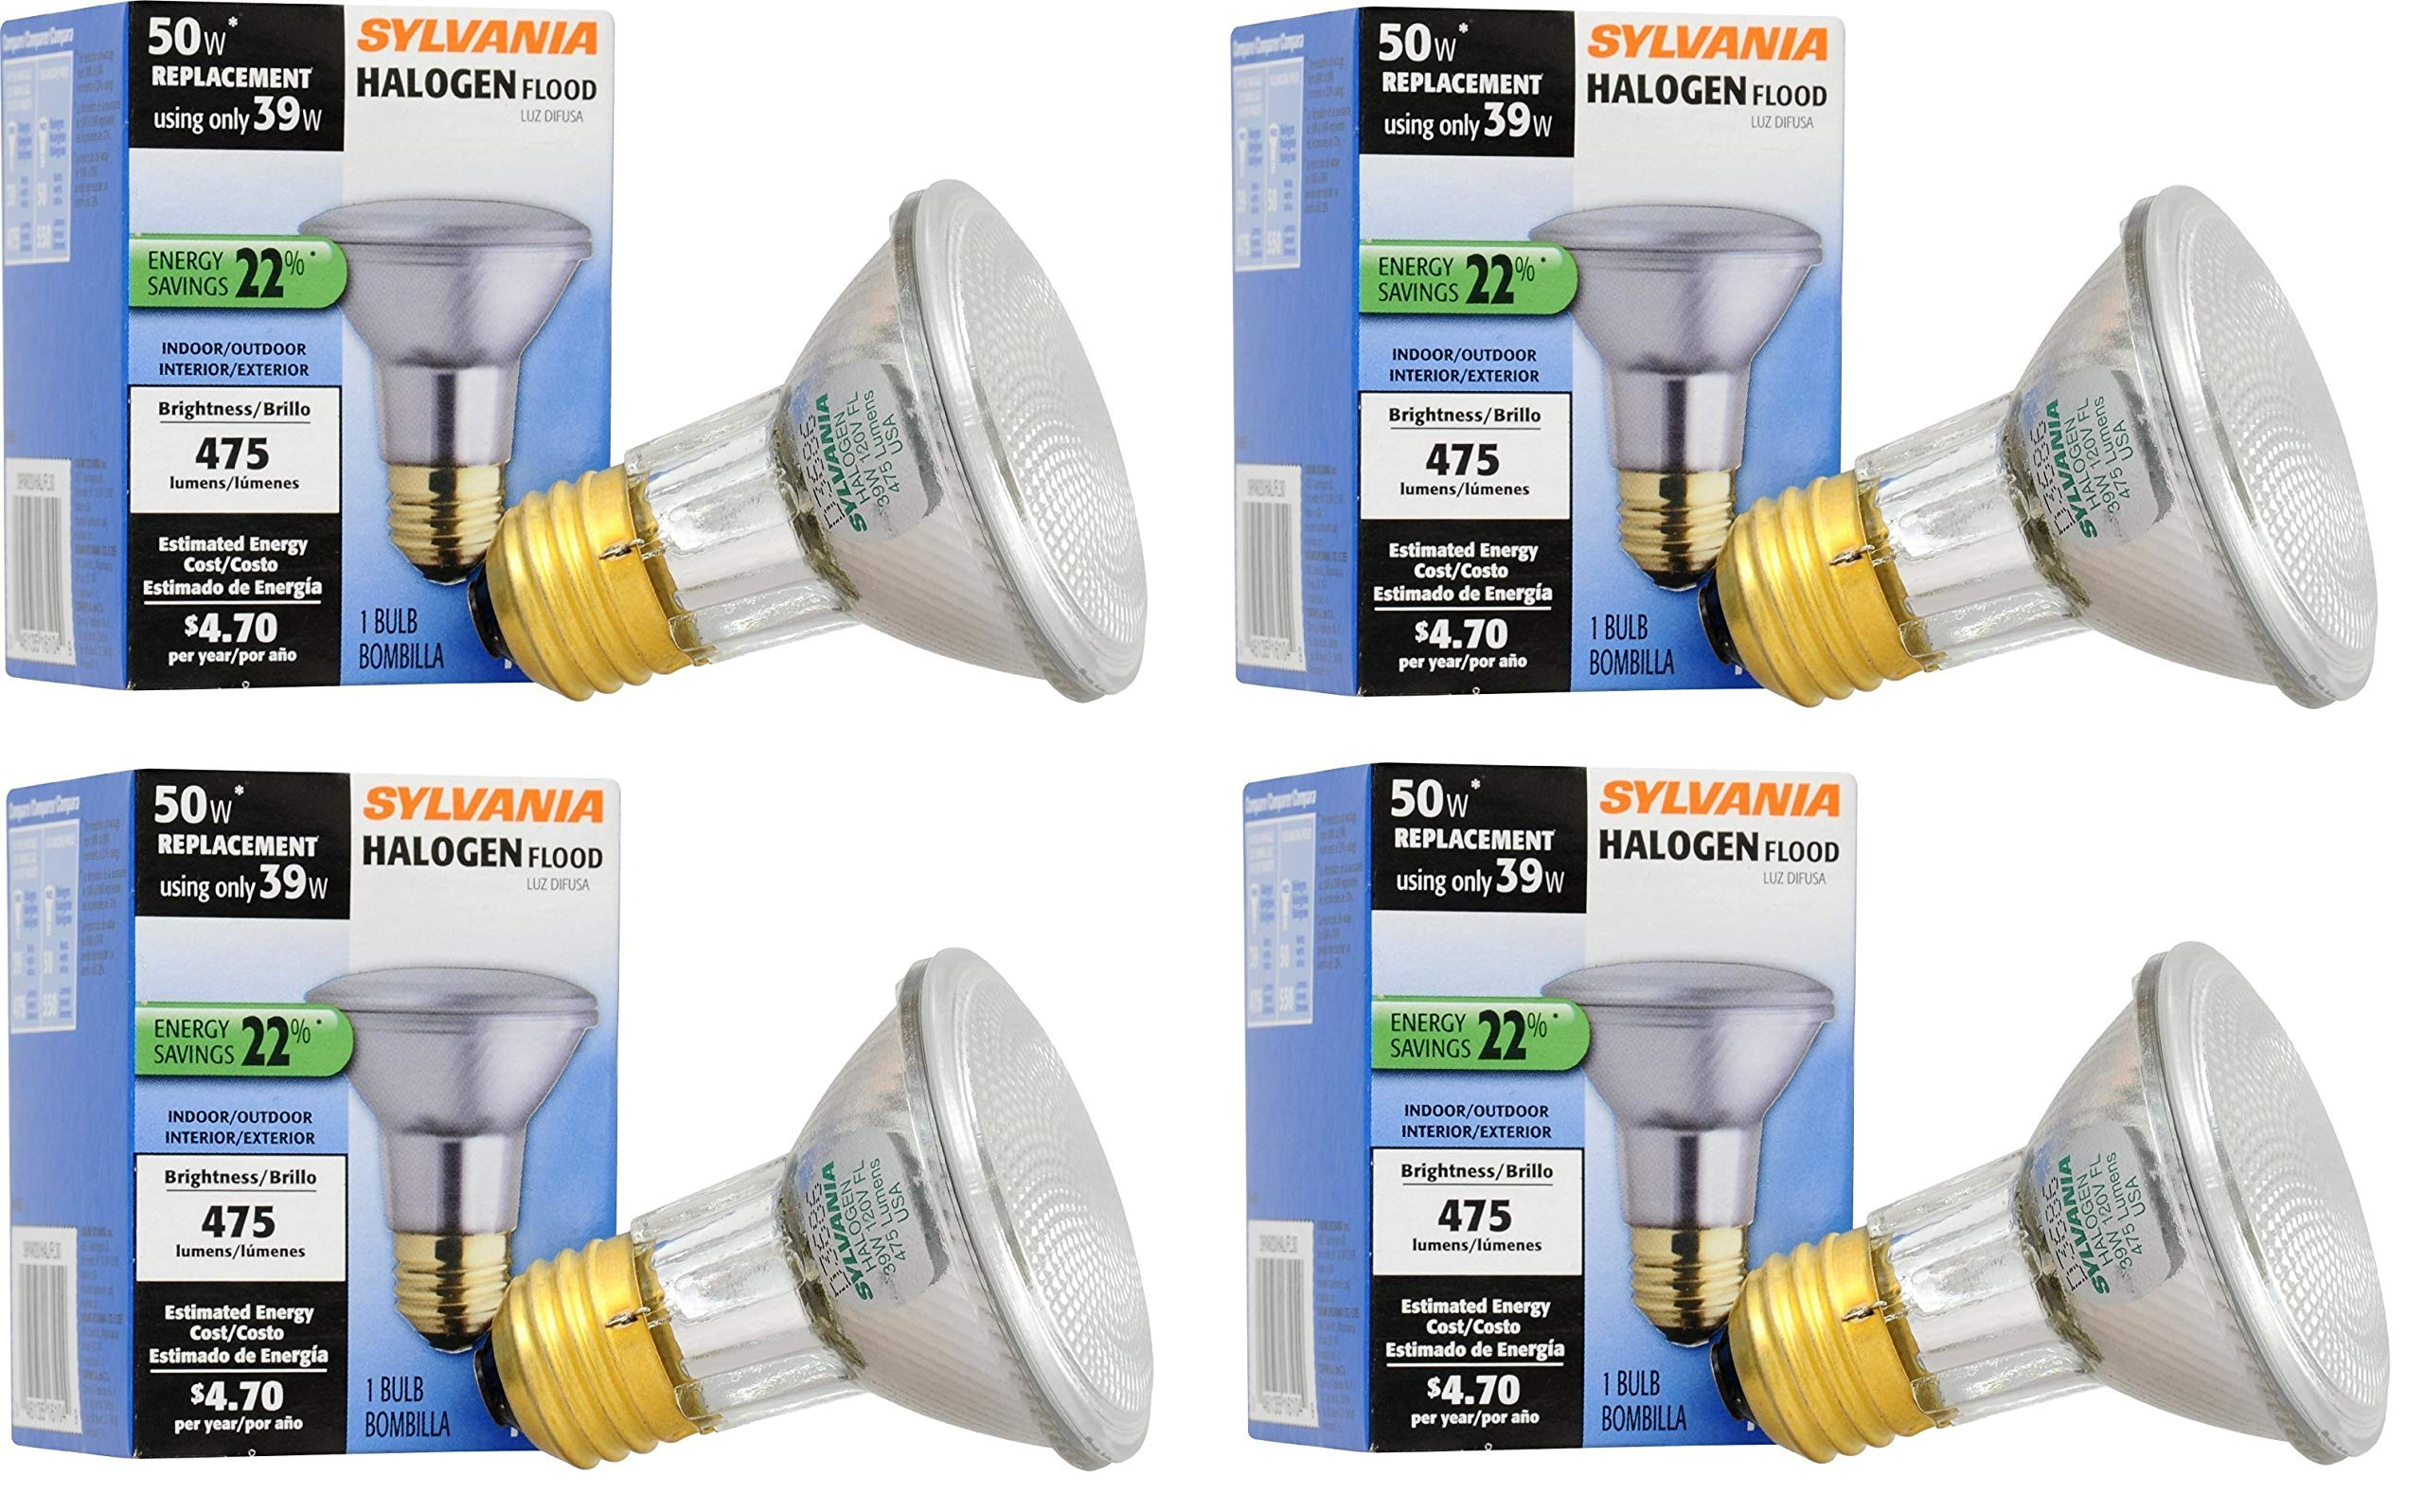 SYLVANIA 4 Pack Capsylite Halogen Dimmable Lamp/PAR20 Flood Light Reflector/50W Replacement/Medium Base E26/39 Watt/2850 K - Warm White (4 Pack) by SYLVANIA